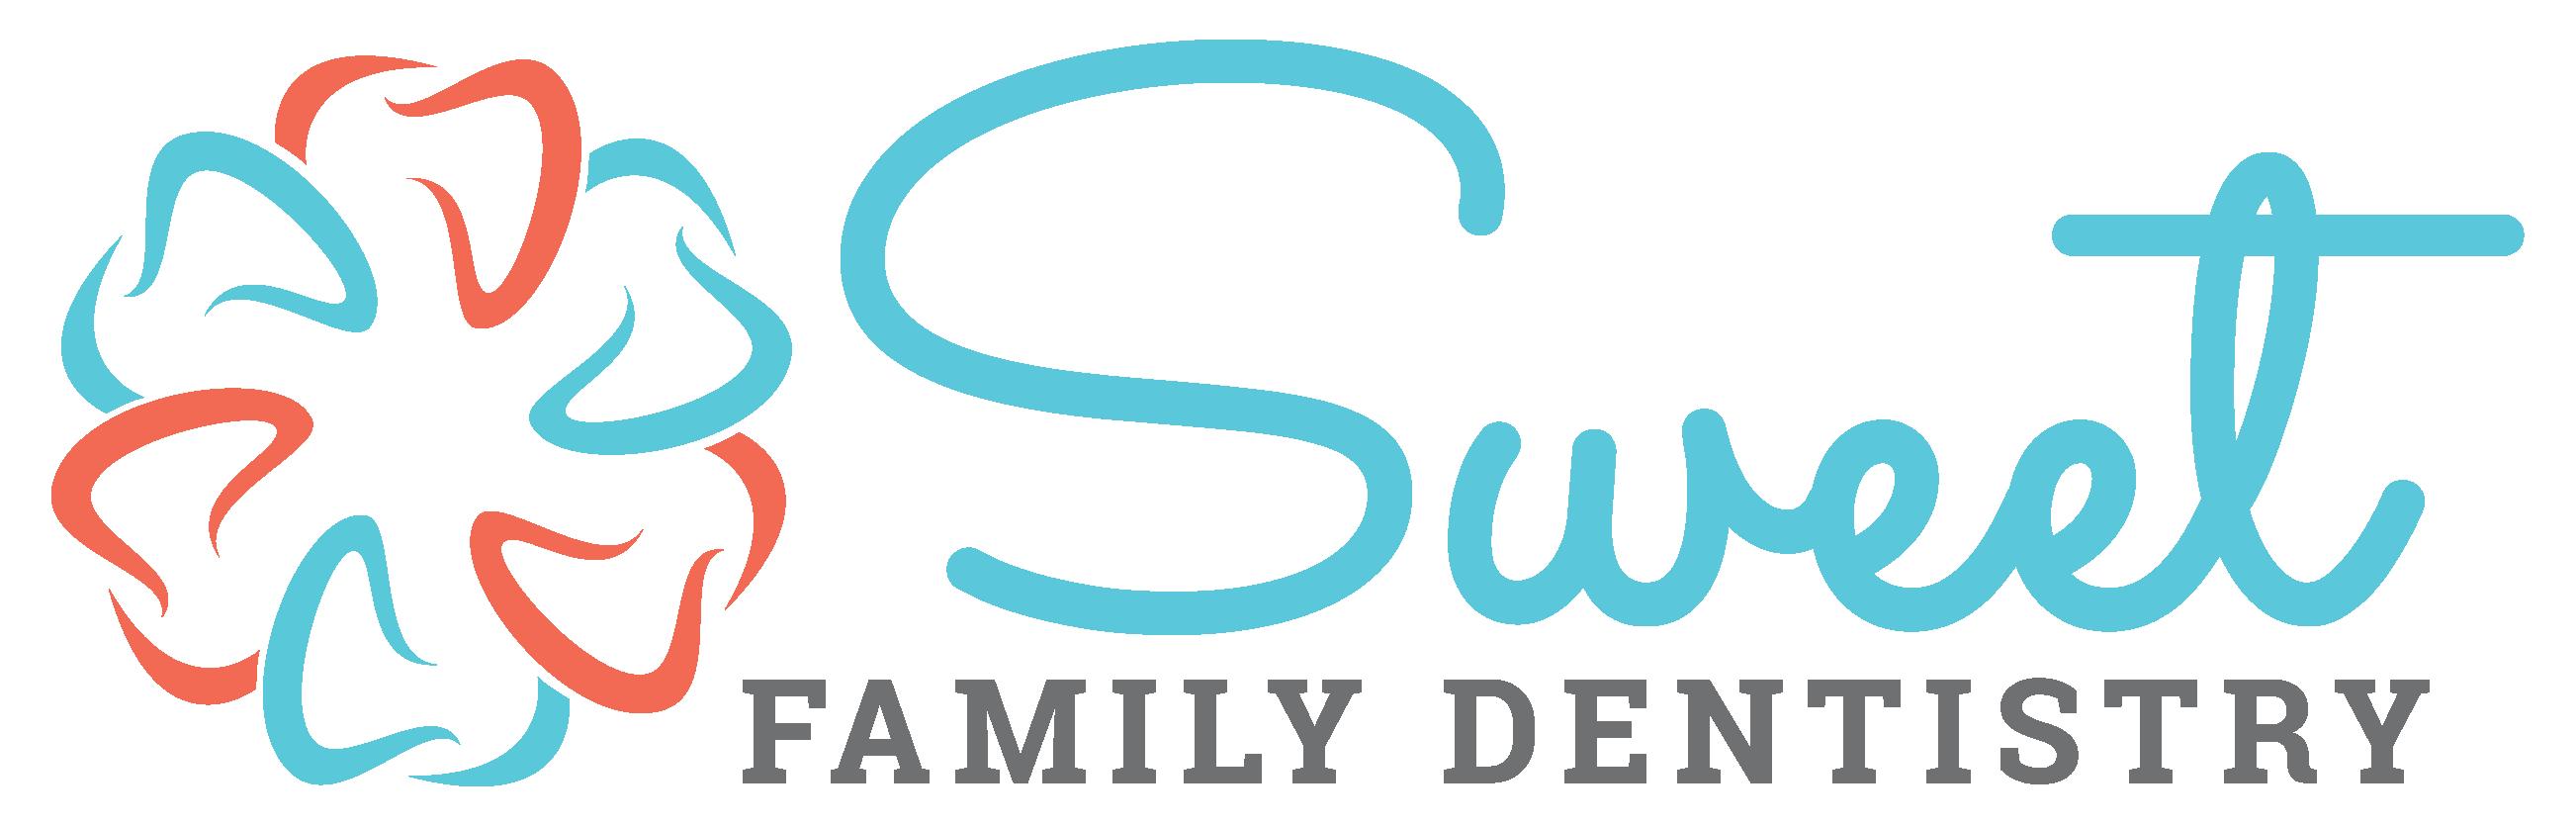 Sweet Family Dentistry® | Family Dentistry in Rowlett, TX